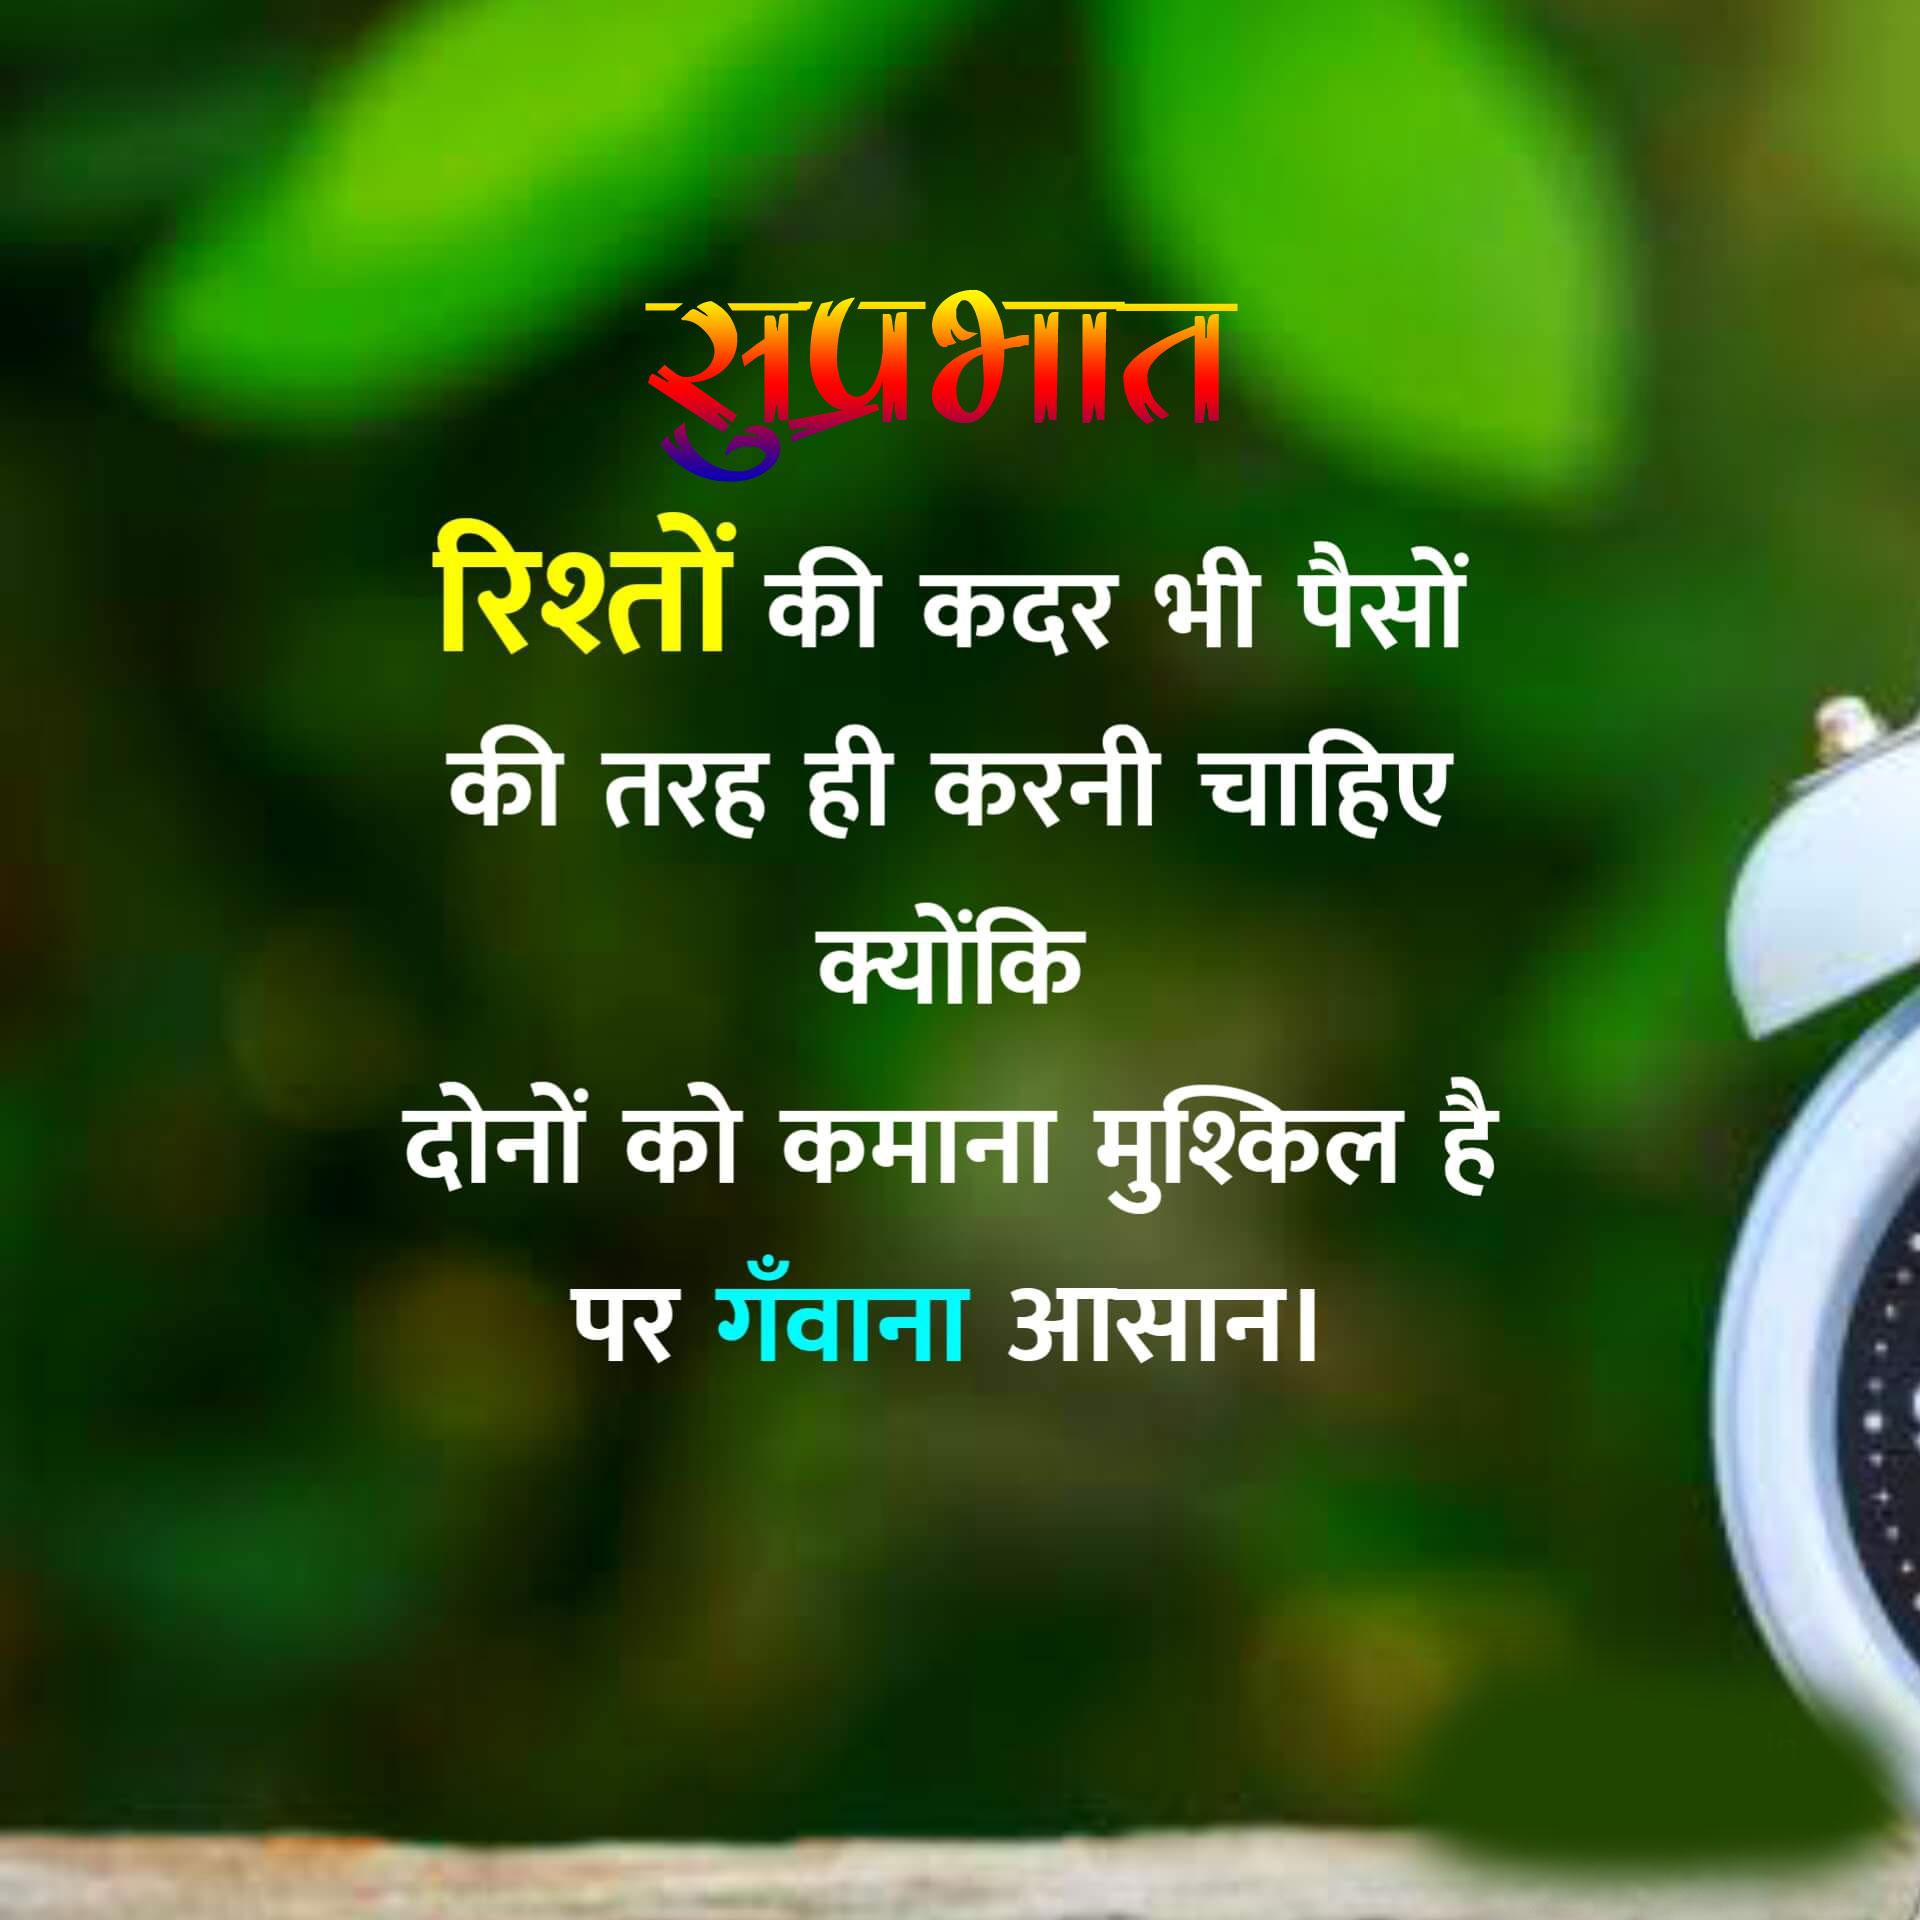 New Beautiful Suprabhat Images pics download